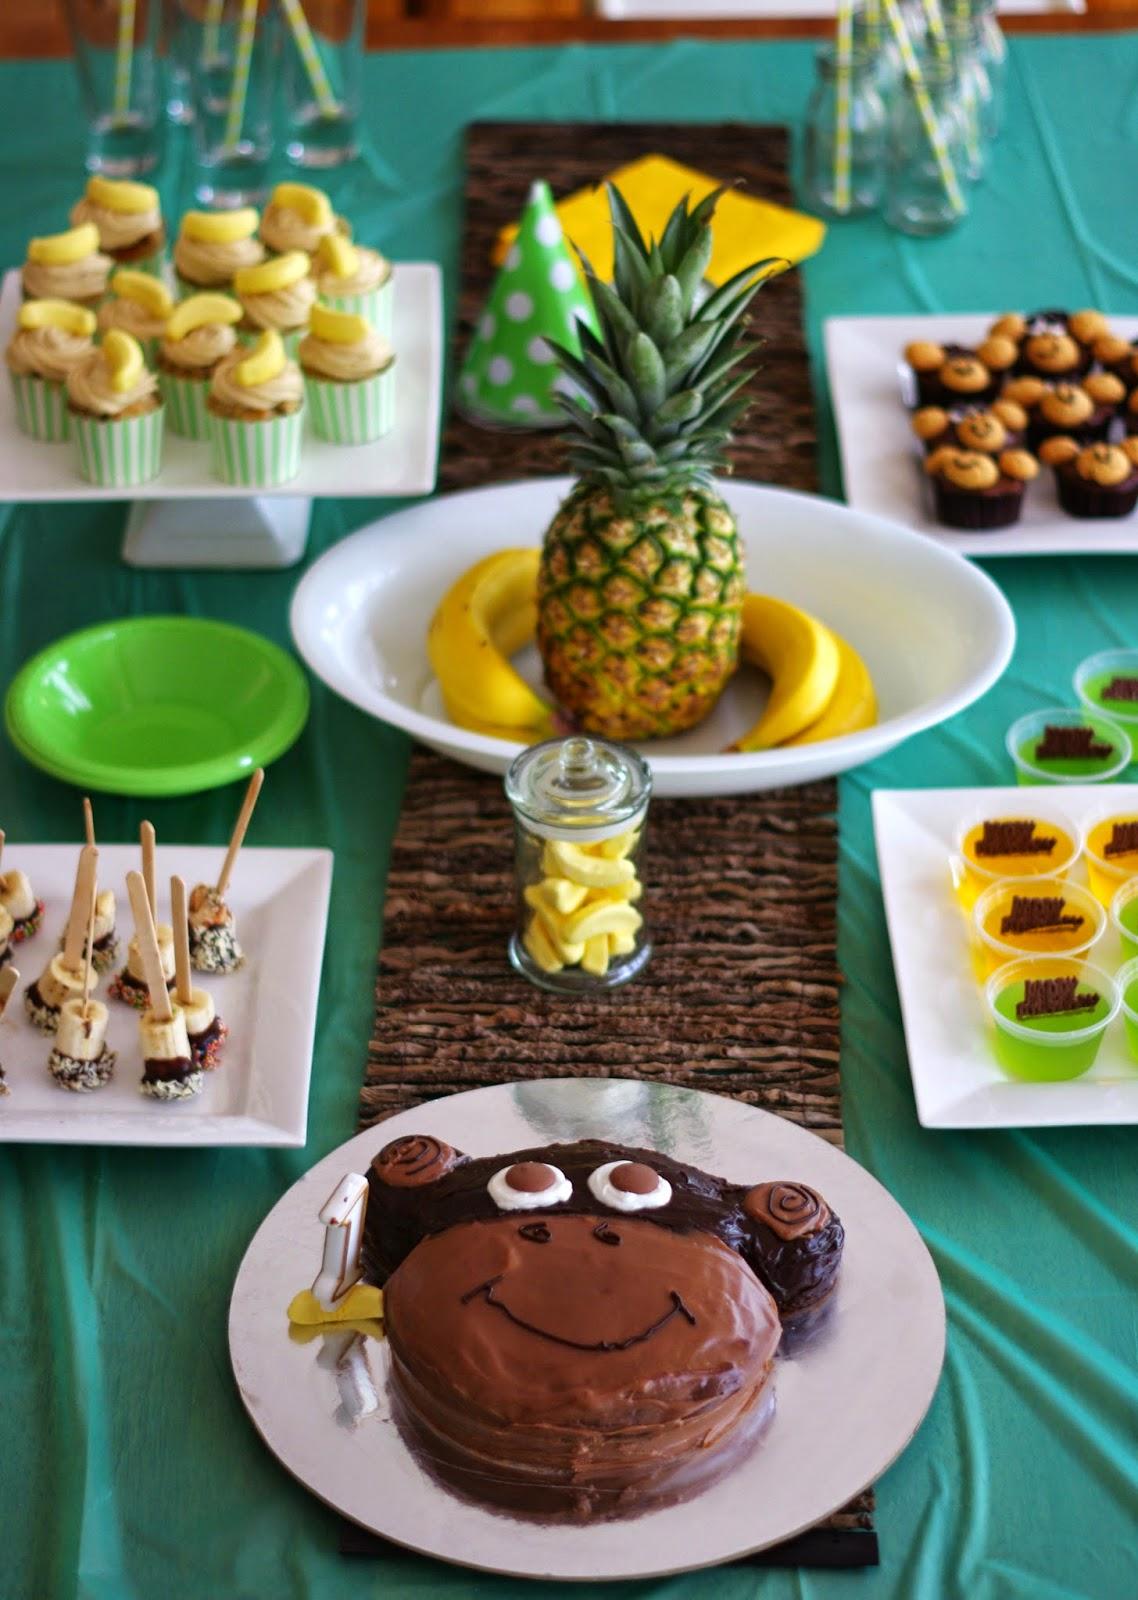 Little Monkey 1st birthday party ideas